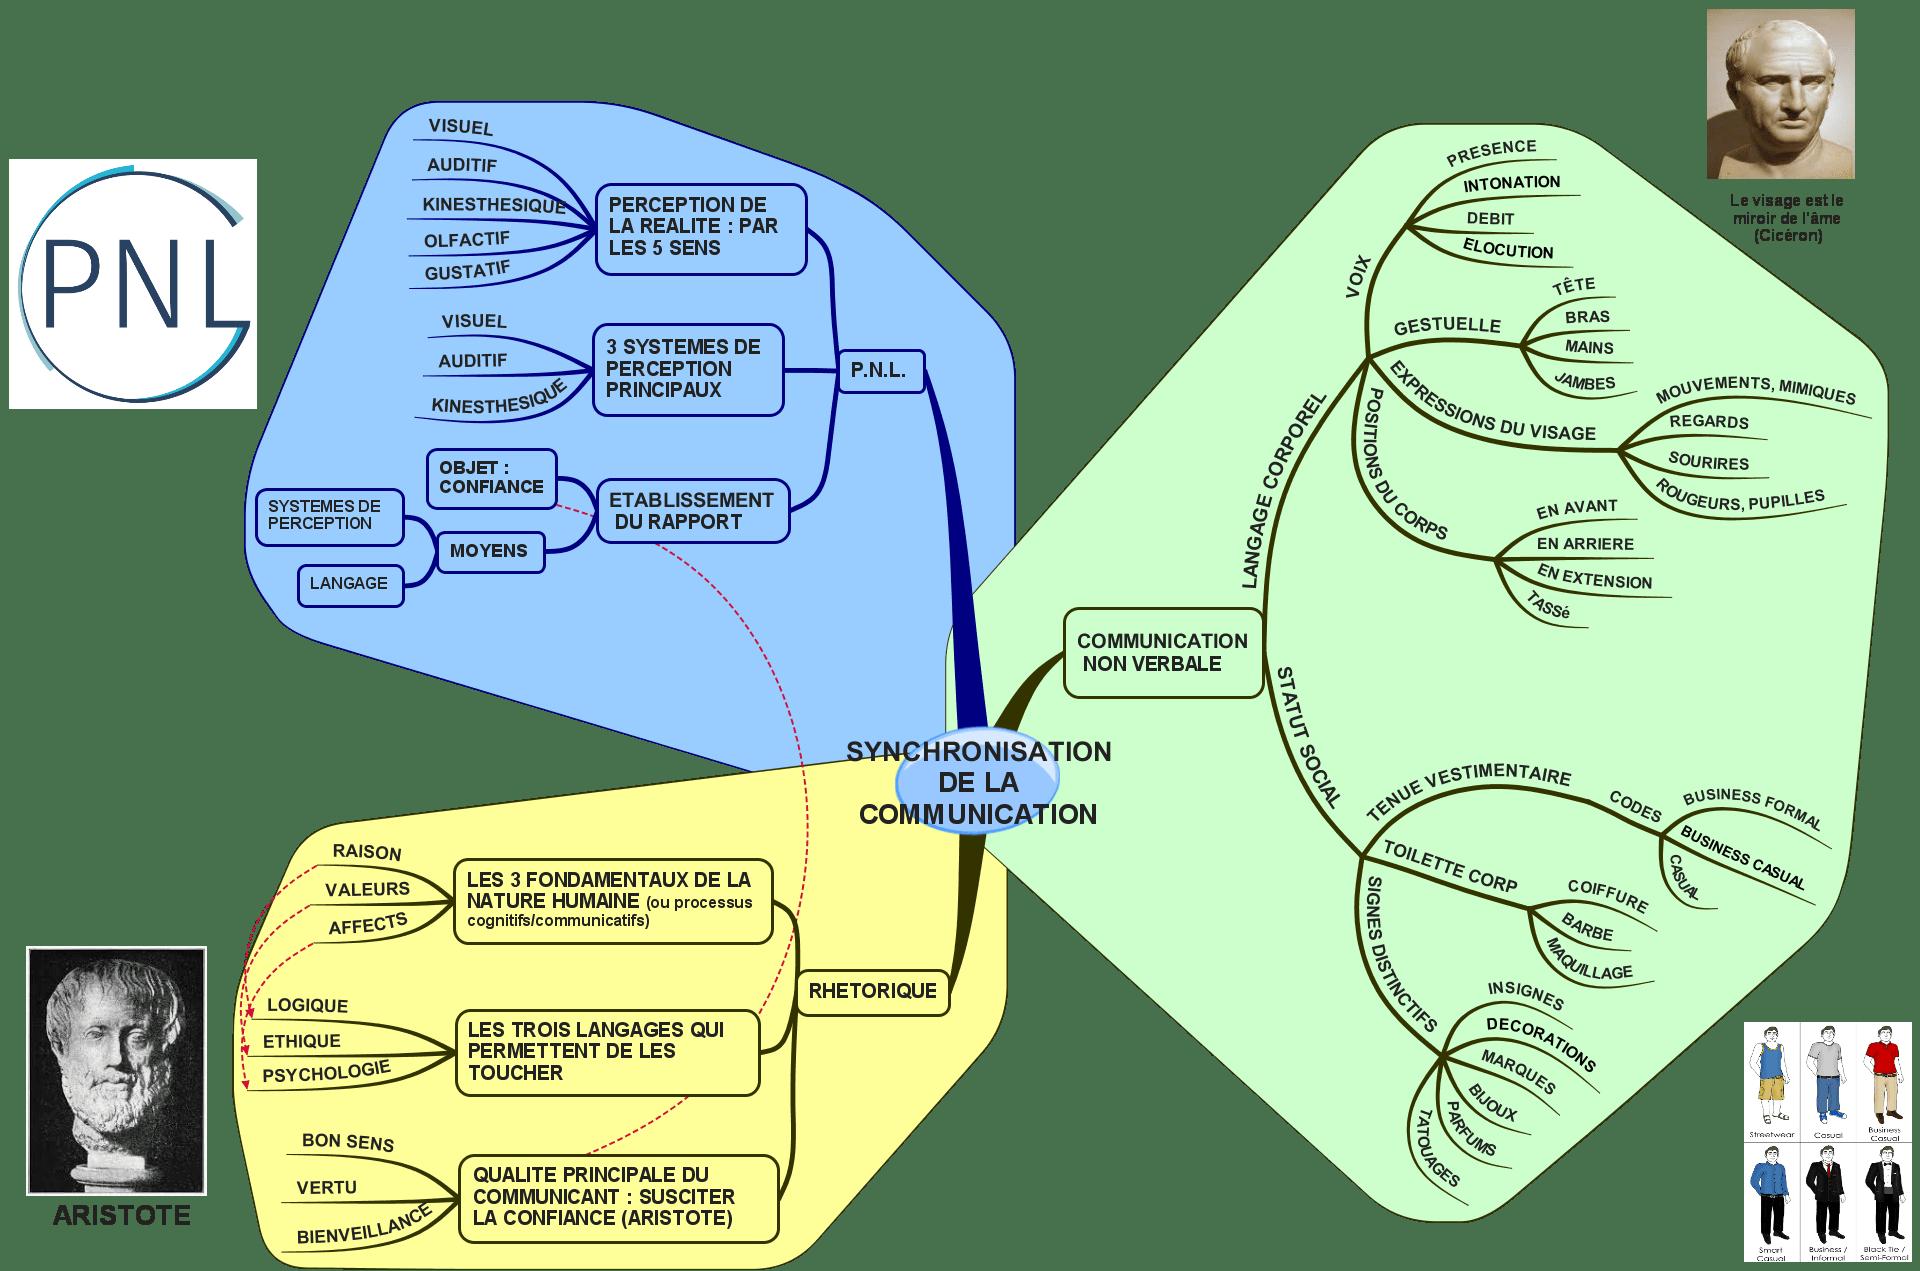 LA SYNCHRONISATION, COEUR DE LA COMMUNICATION